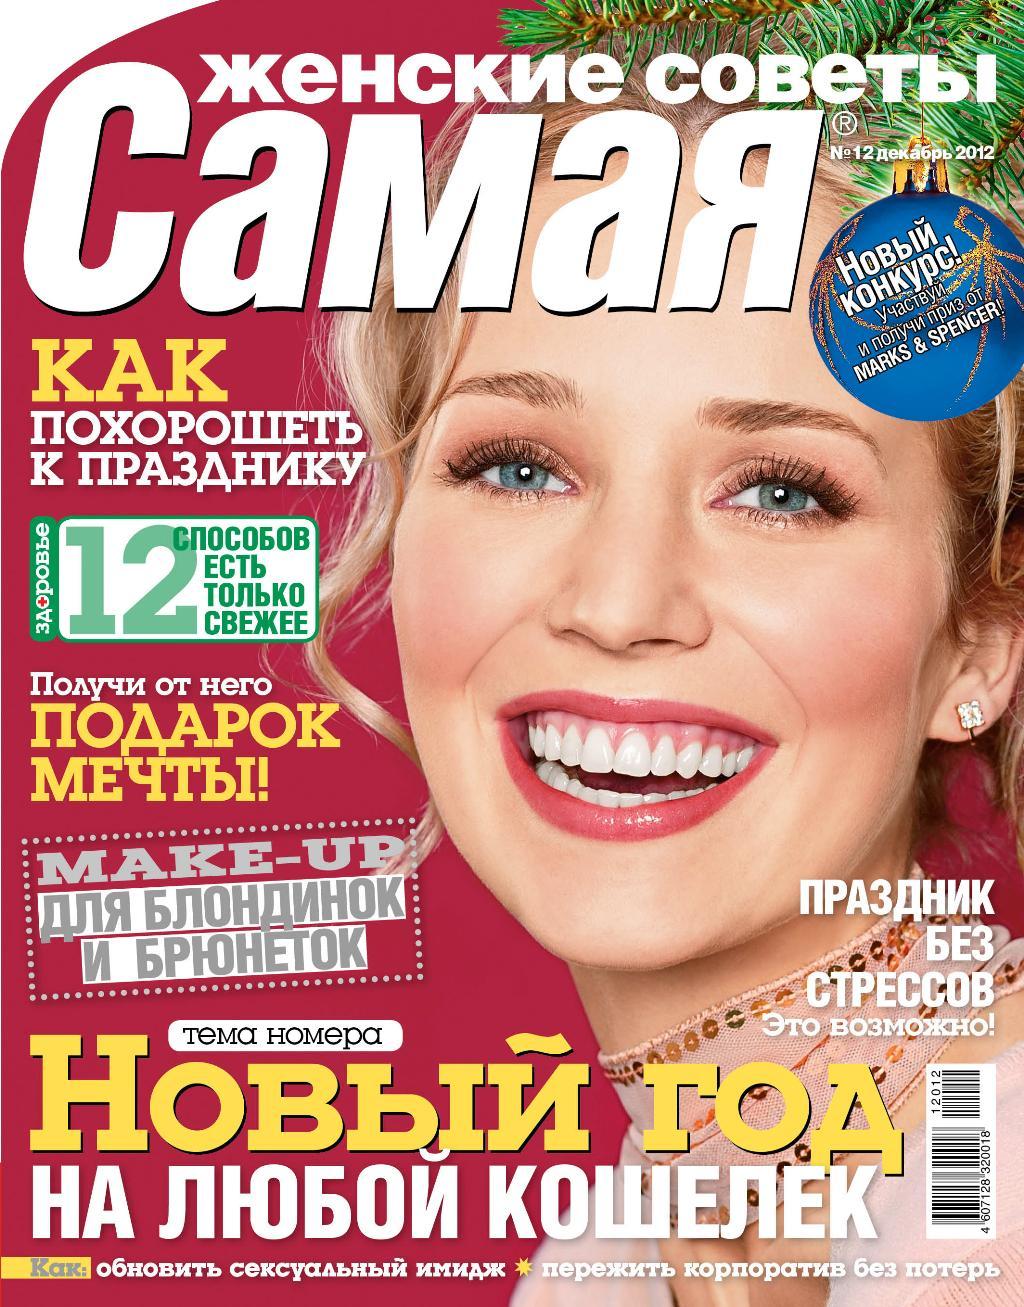 Смотреть картинки журналов